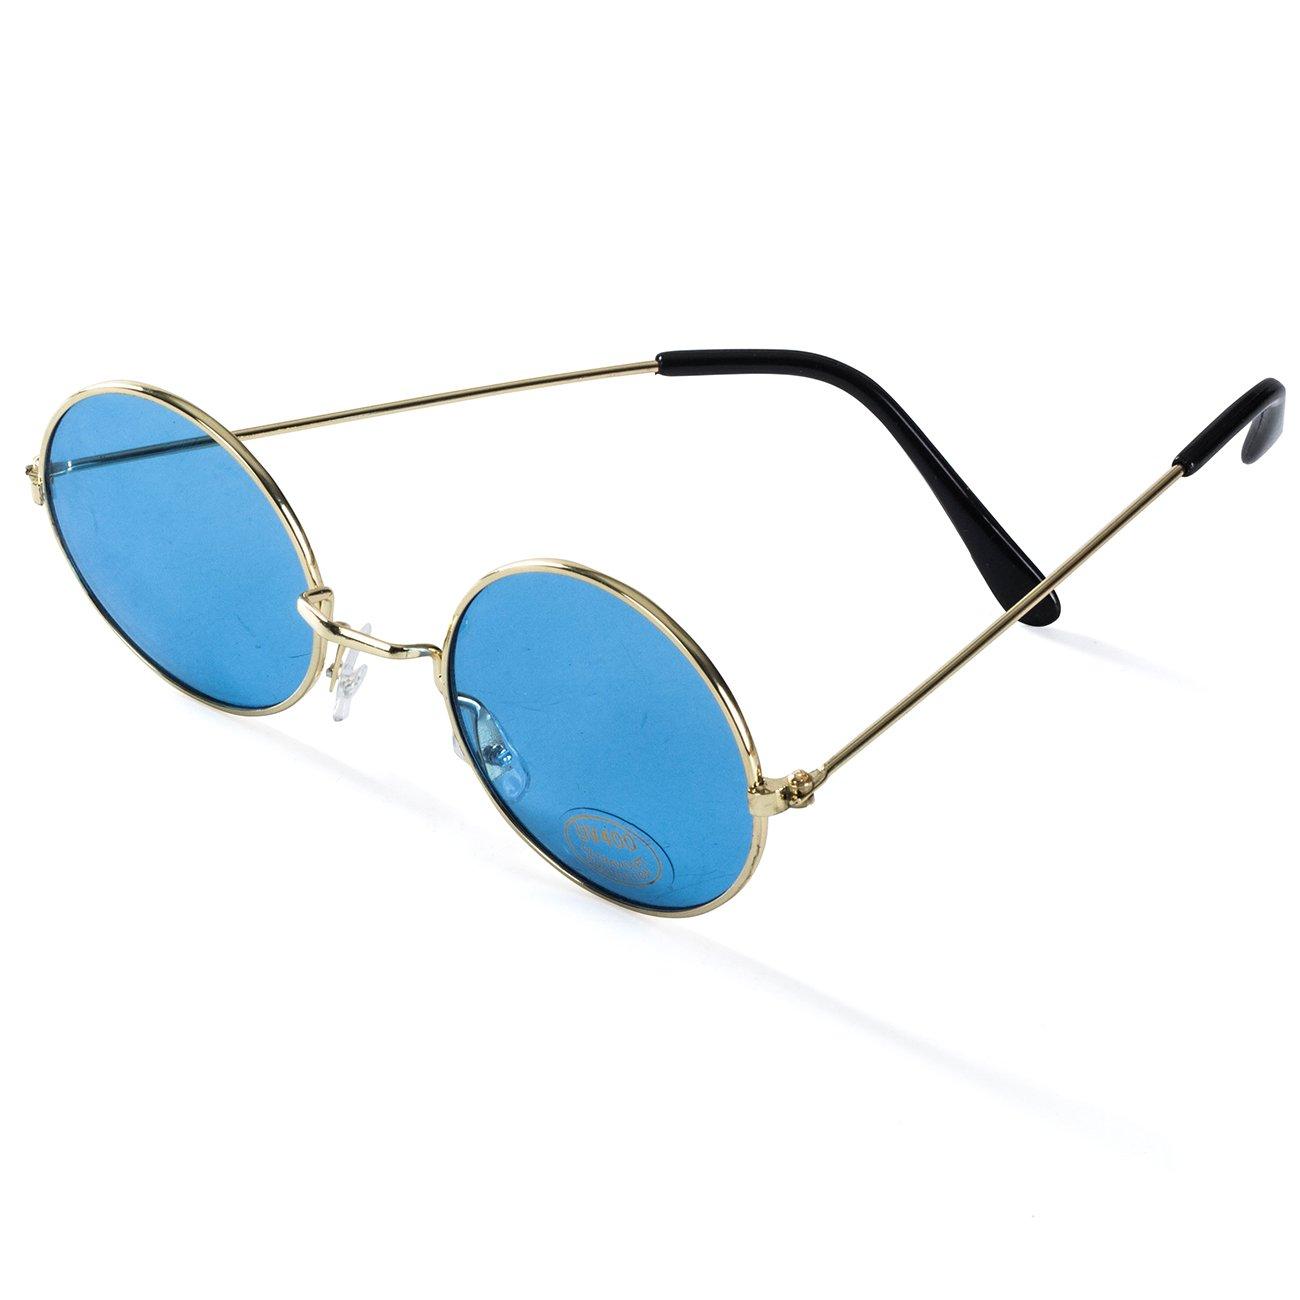 2 Pack Retro Costume Glasses Costume Glasses Hippie Sunglasses Tigerdoe John Lennon Glasses John Lennon Sunglasses